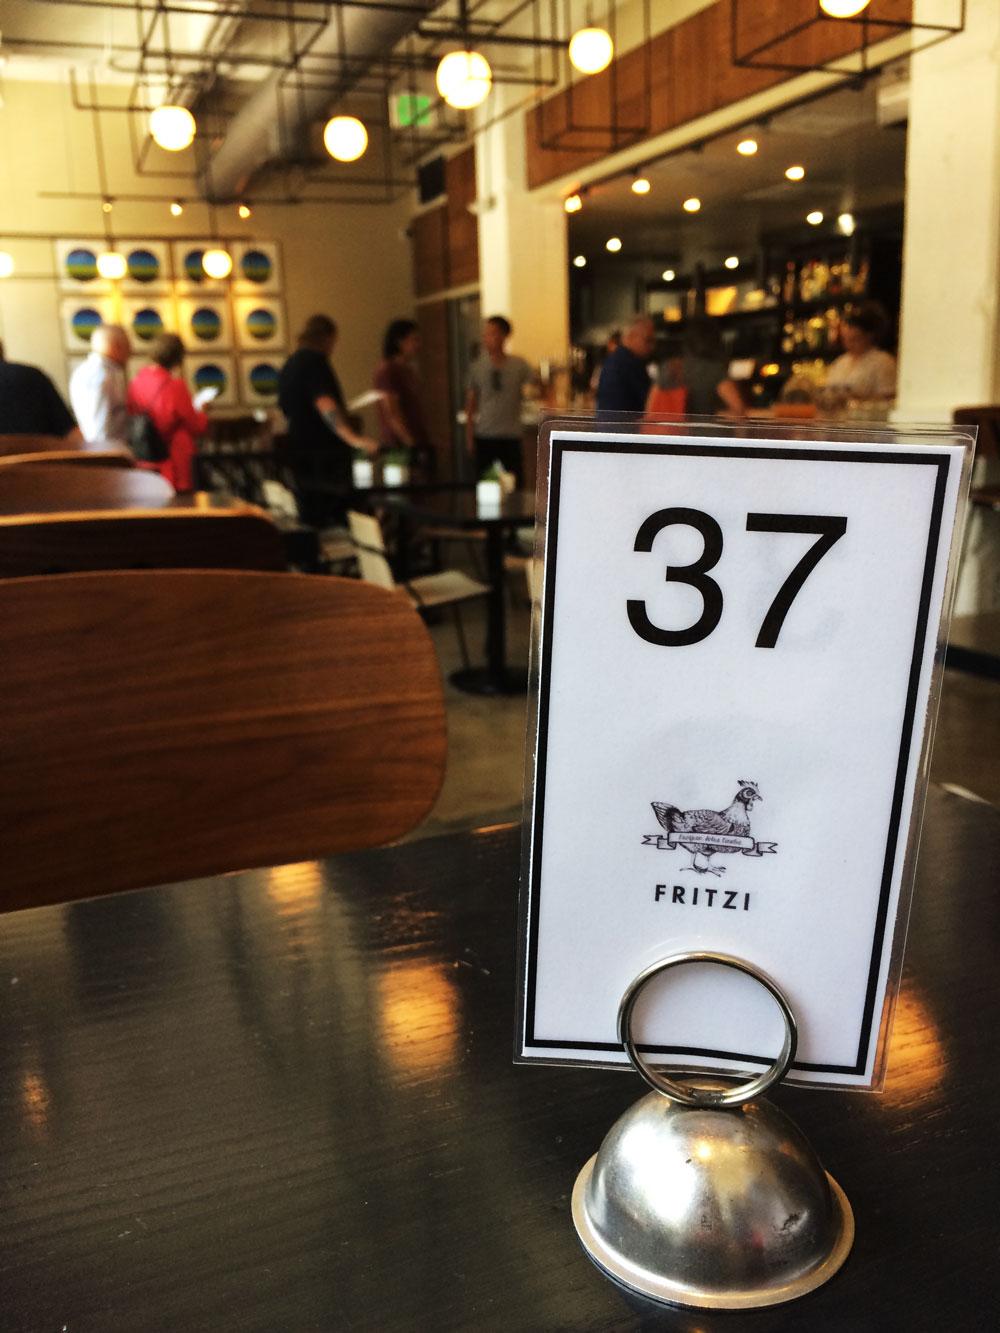 jestcafe-com-frtizi9